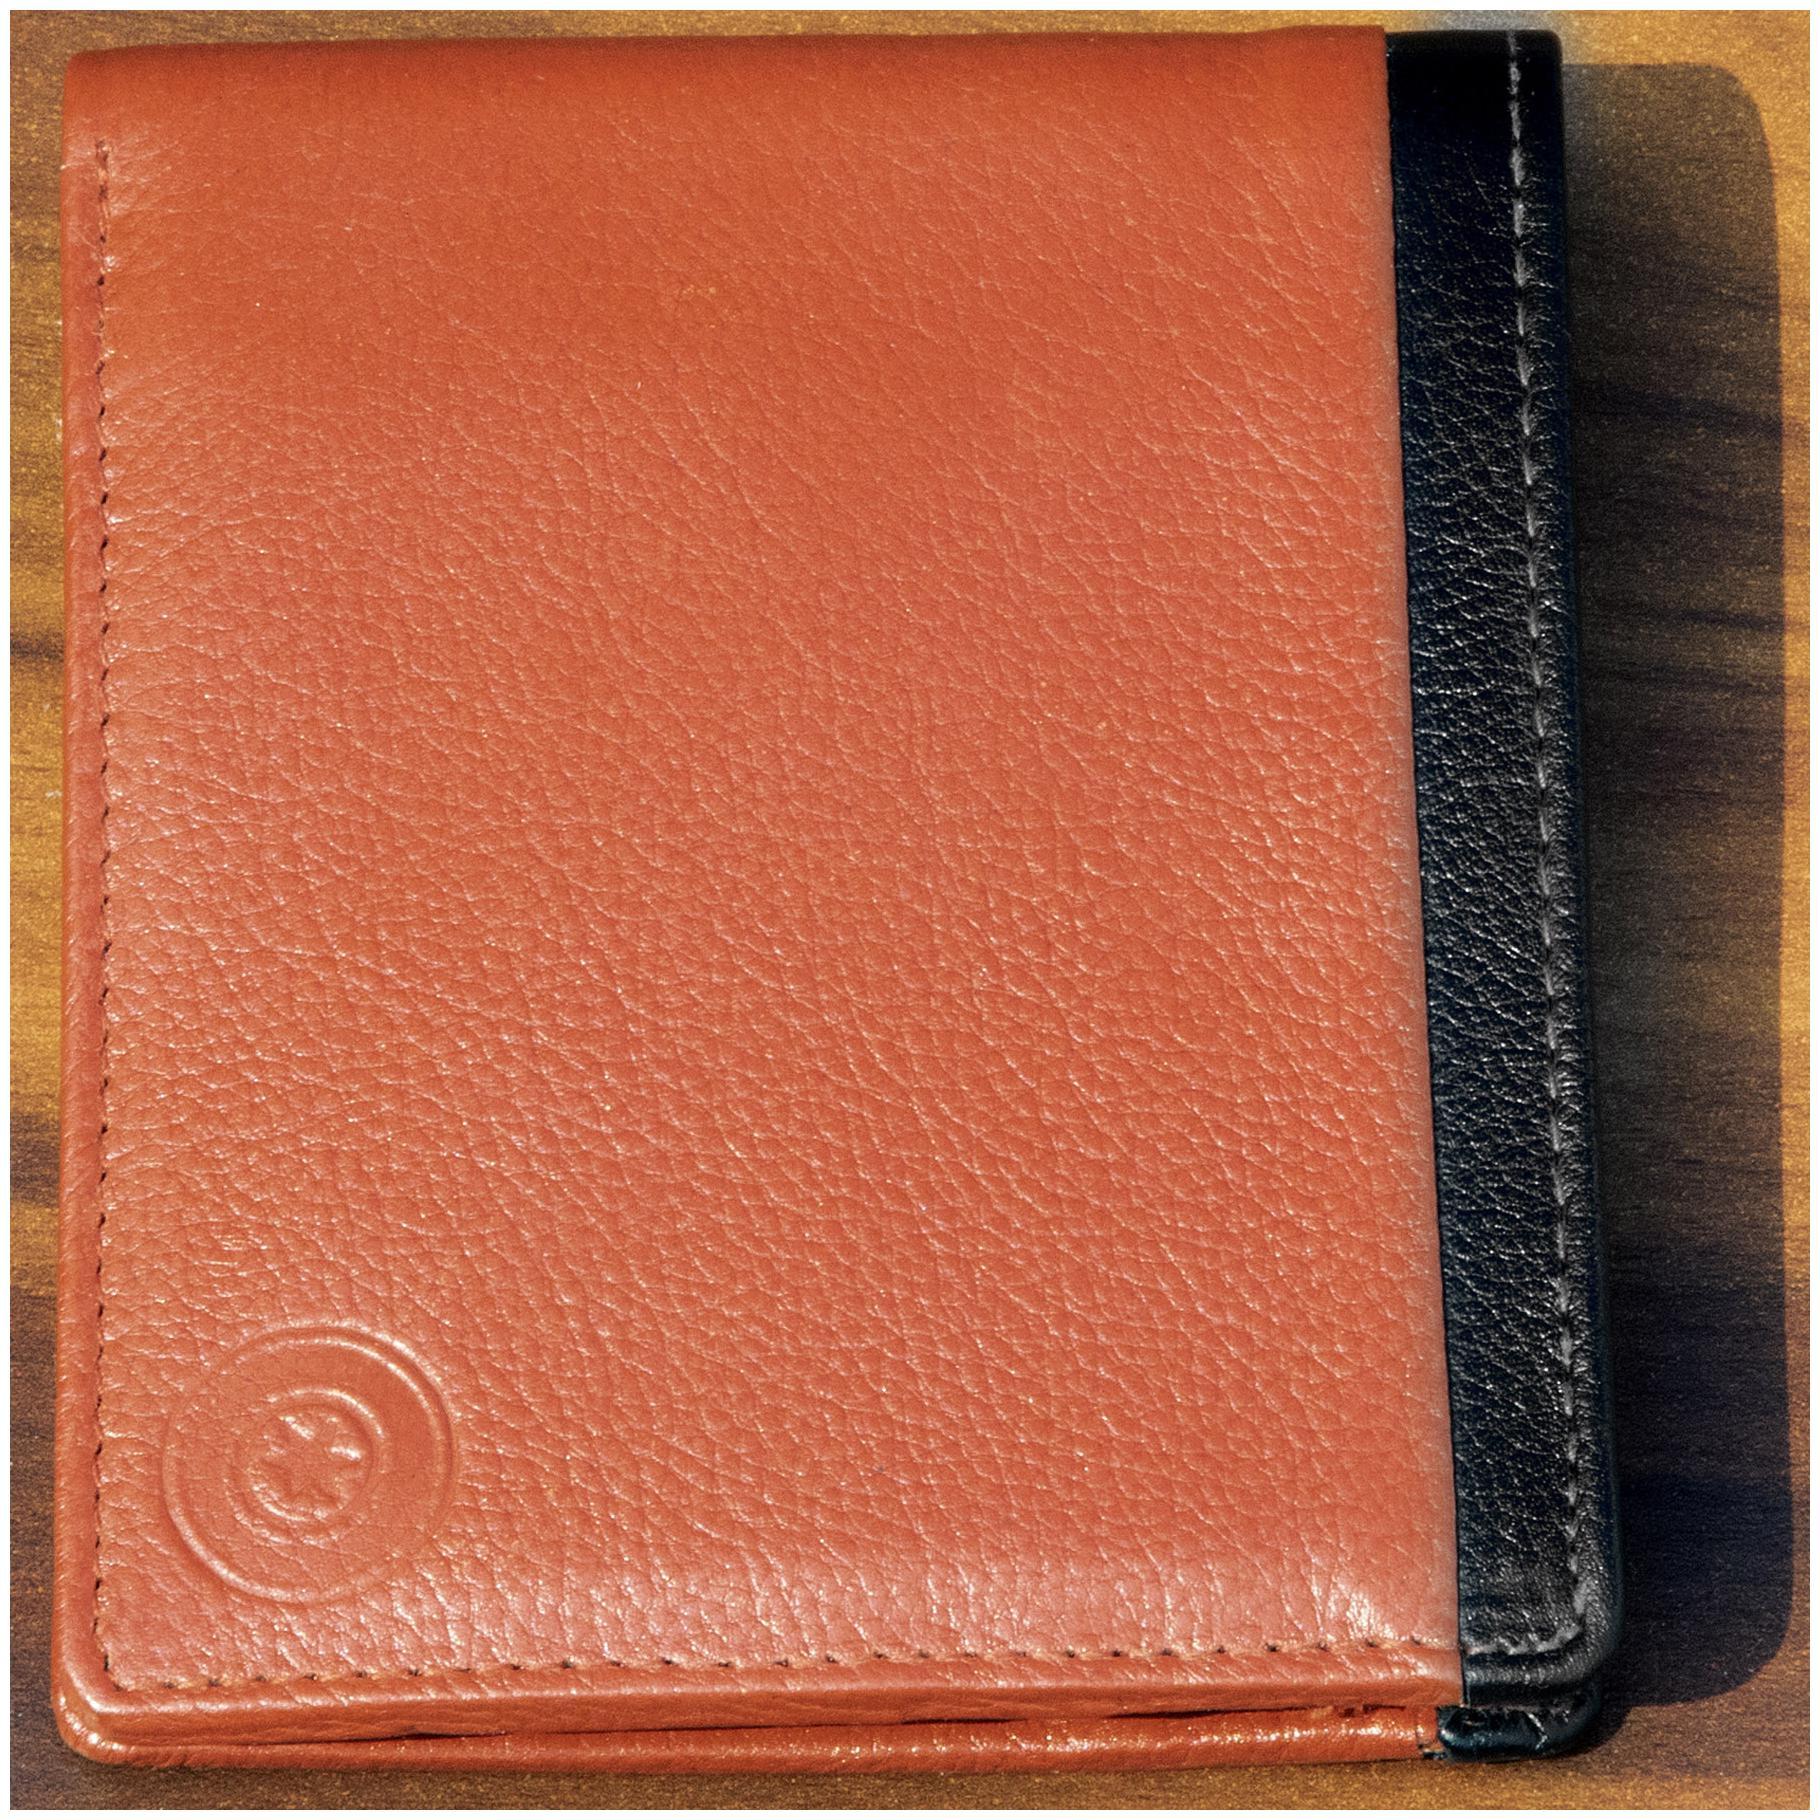 Hard Case Passport Holder Rice Grain Geometric Figure Stylish Pu Leather Travel Accessories Passports Covers For Women Men